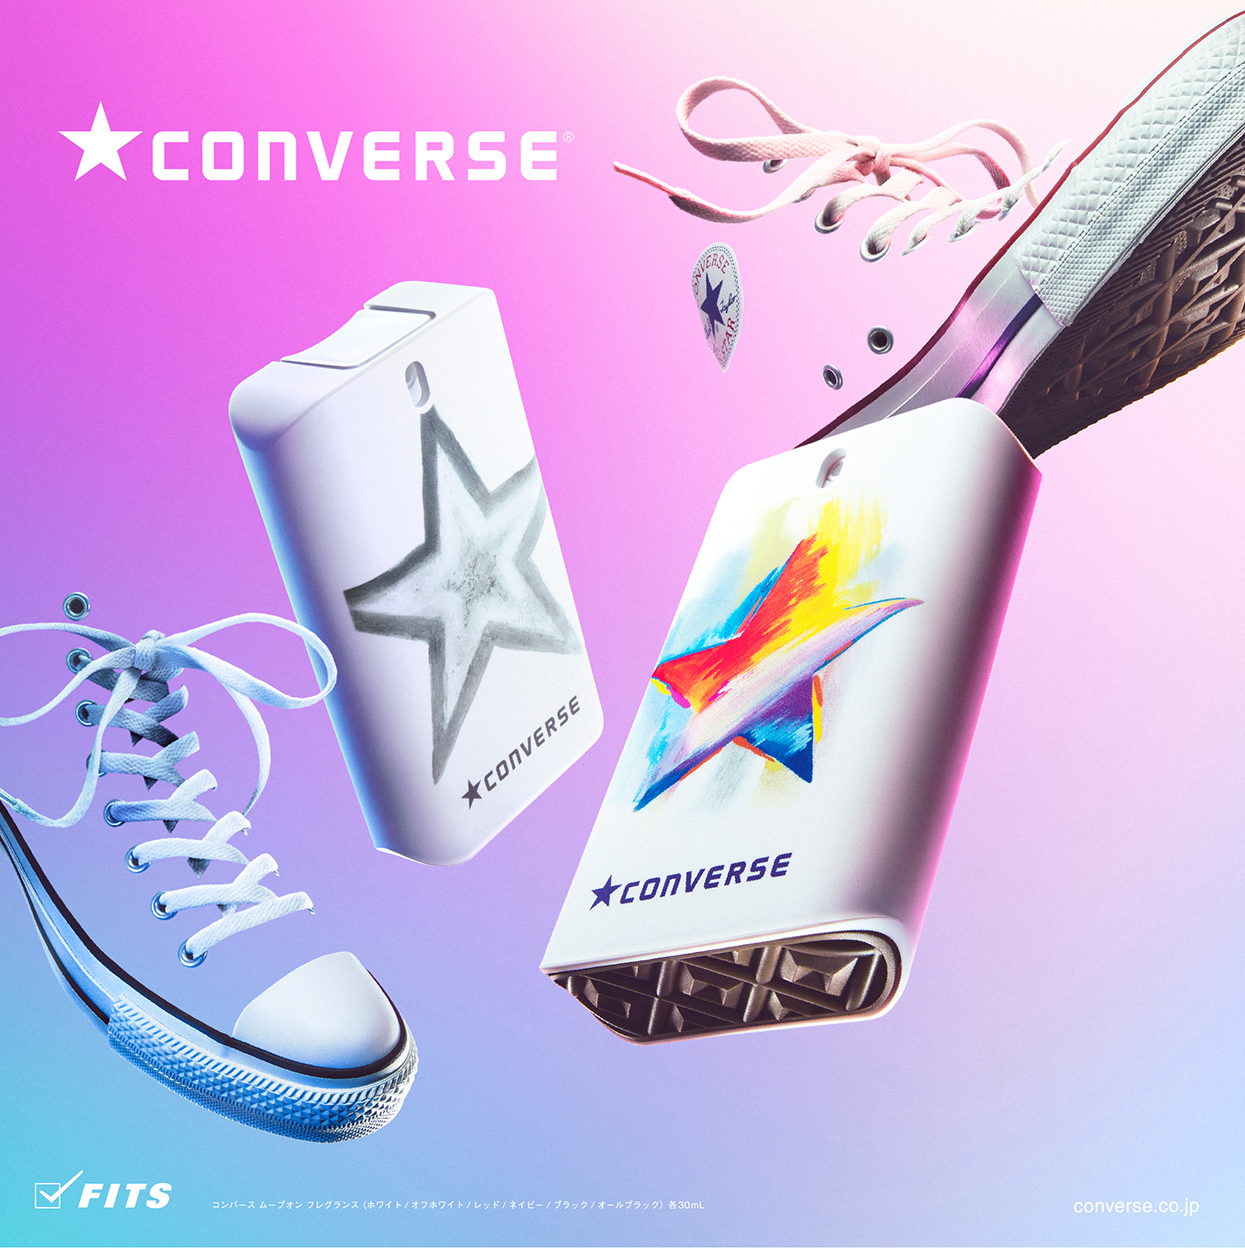 Converse kv w450h450 b